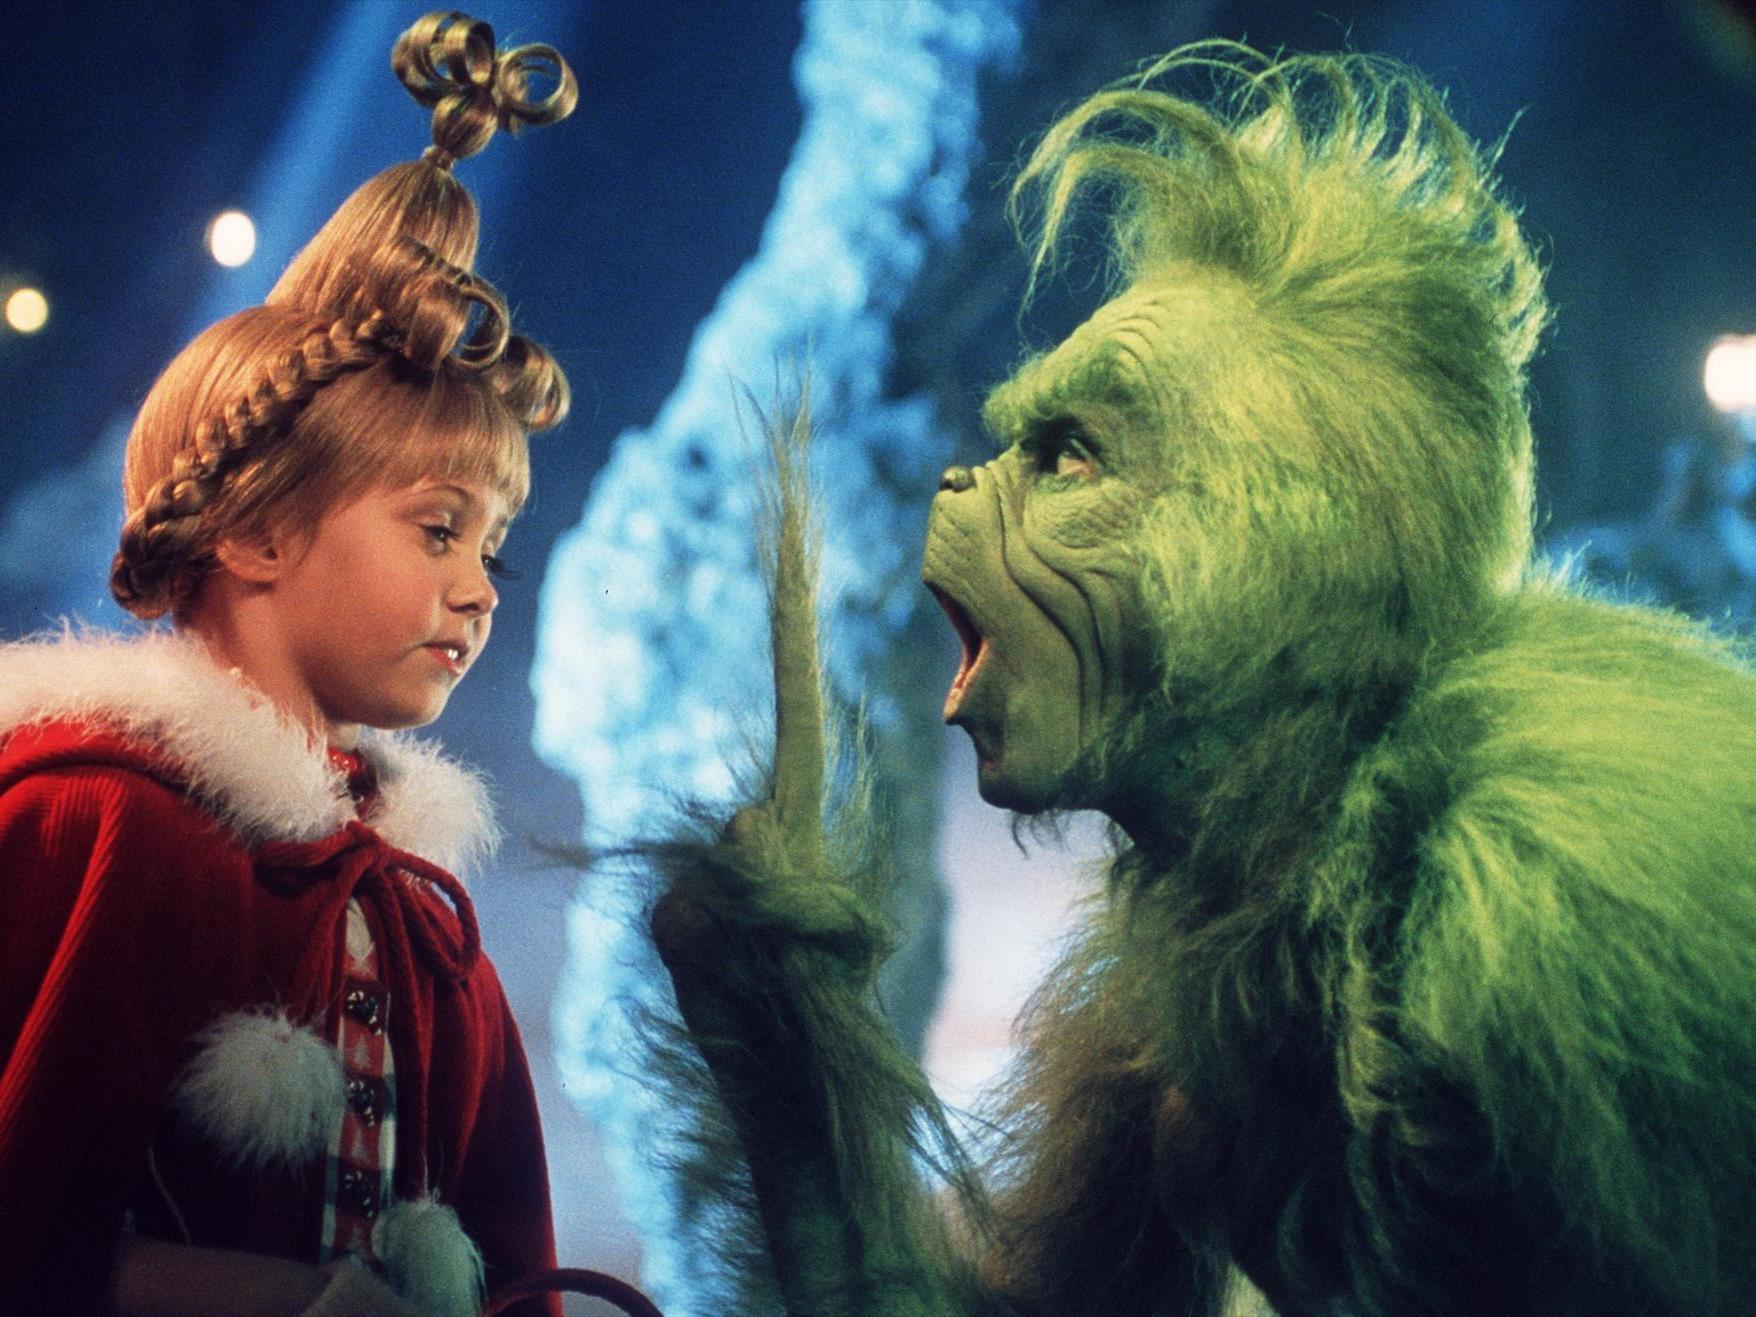 Filme Zu Weihnachten 2019.Weihnachten Filme Weihnachten 2019